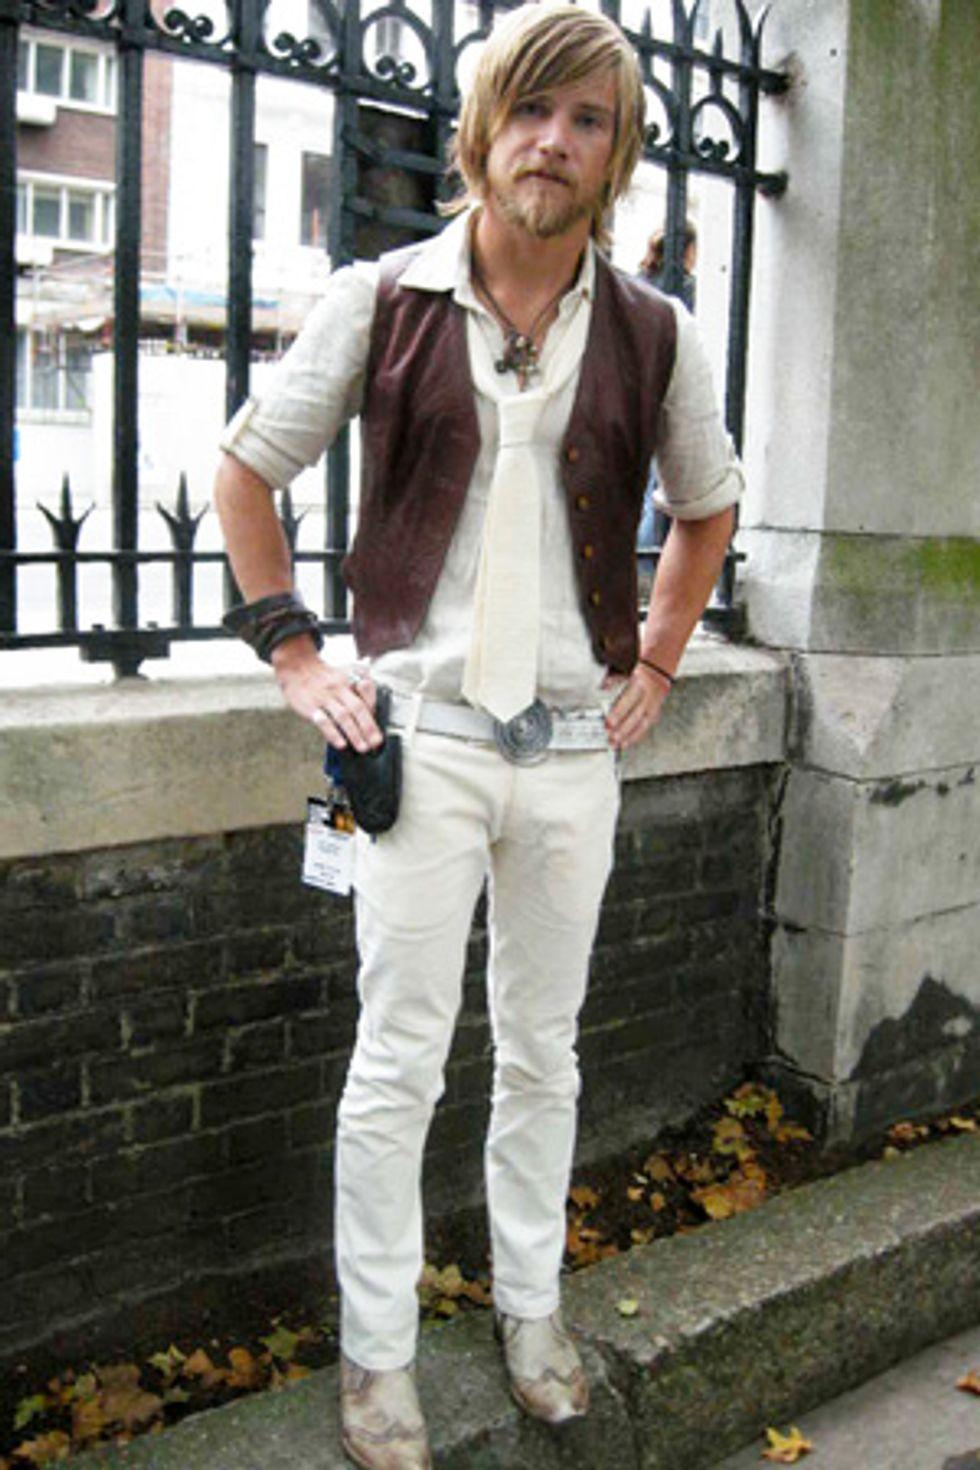 London Fashion Week Cornered Style: Jeff Garner